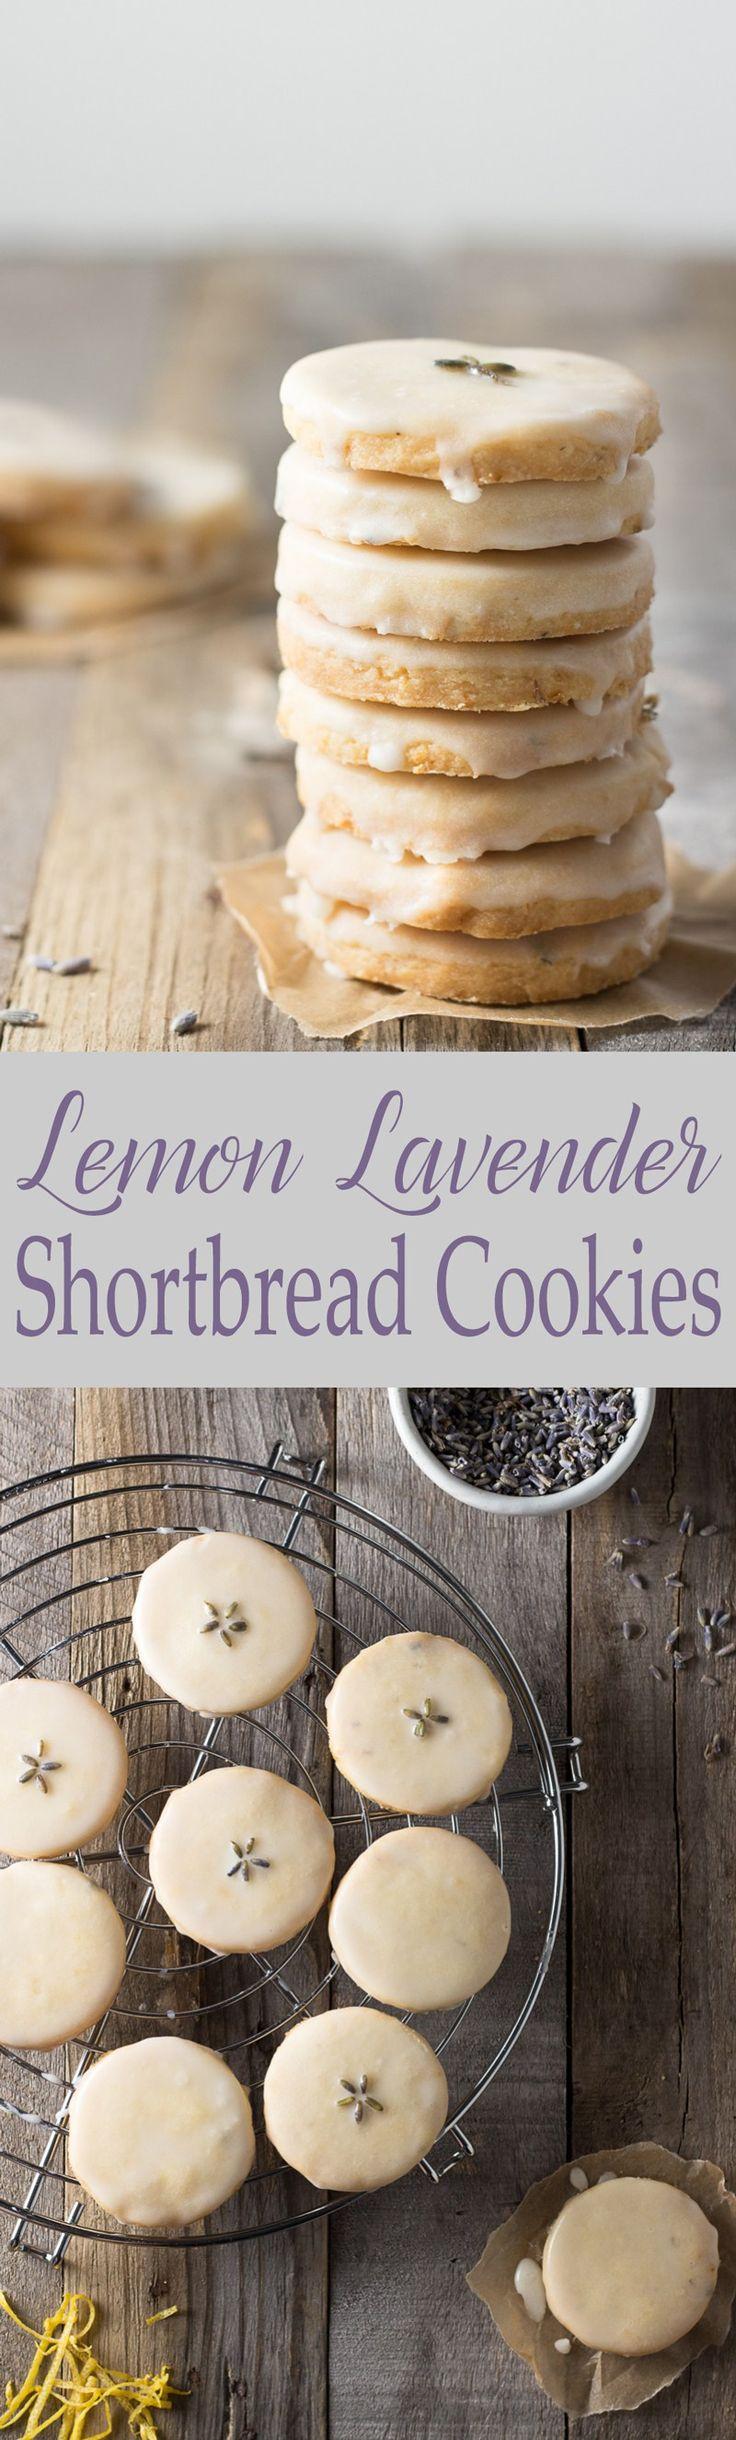 Lemon Lavender Shortbread Cookies   Brinasbites.com @Brina's Bites